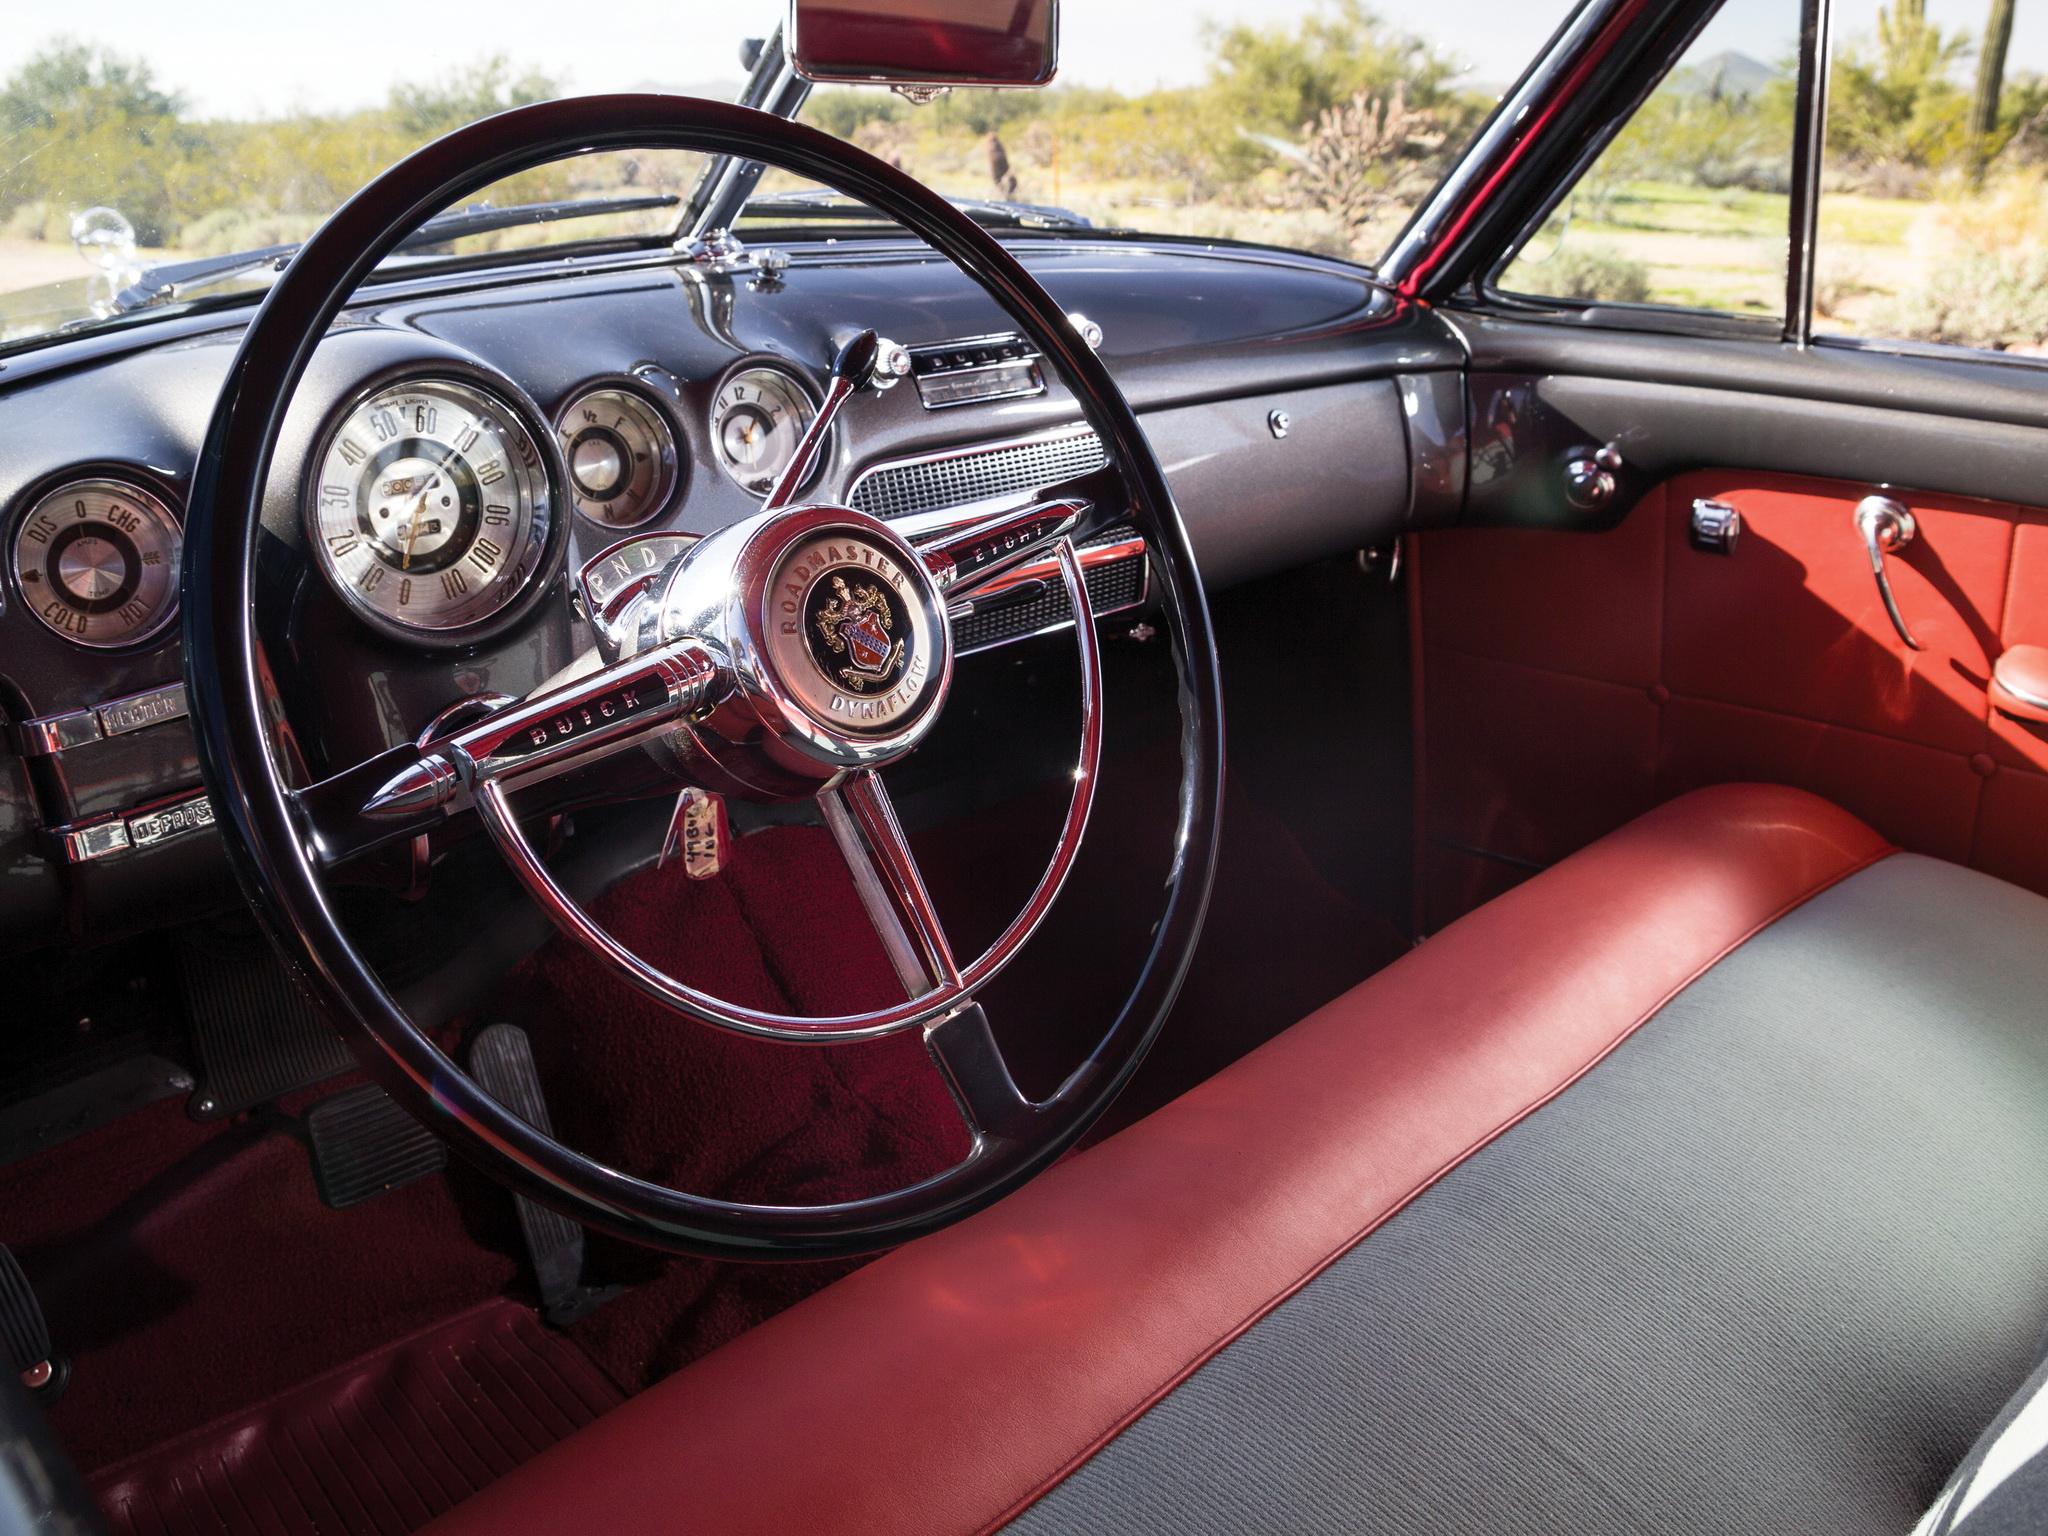 D C E Ecbd Daa Def E Ebdb likewise Buick Roadmaster Convertible Ameriky American Cars For Sale further Buick Skylark Gs American Cars For Sale X together with Buick Cascada Convertible American Cars For Sale X X in addition Buick Hartop Dv Mdb. on 1949 buick roadmaster riviera